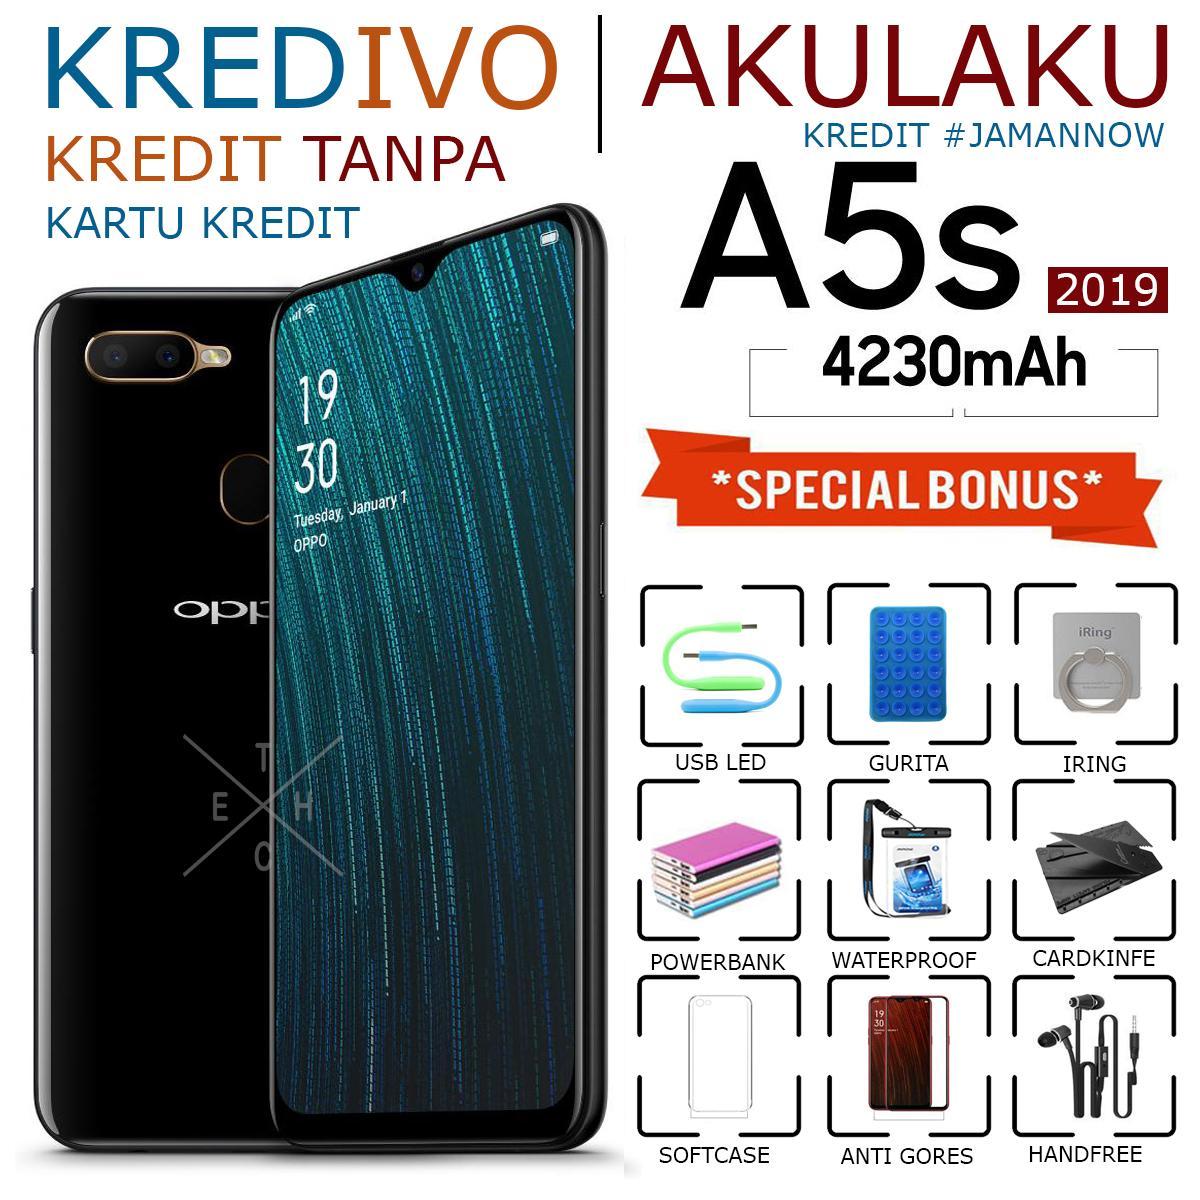 OPPO A5S 2019 - 2GB/32GB - 4G LTE - GARANSI RESMI - BLACK